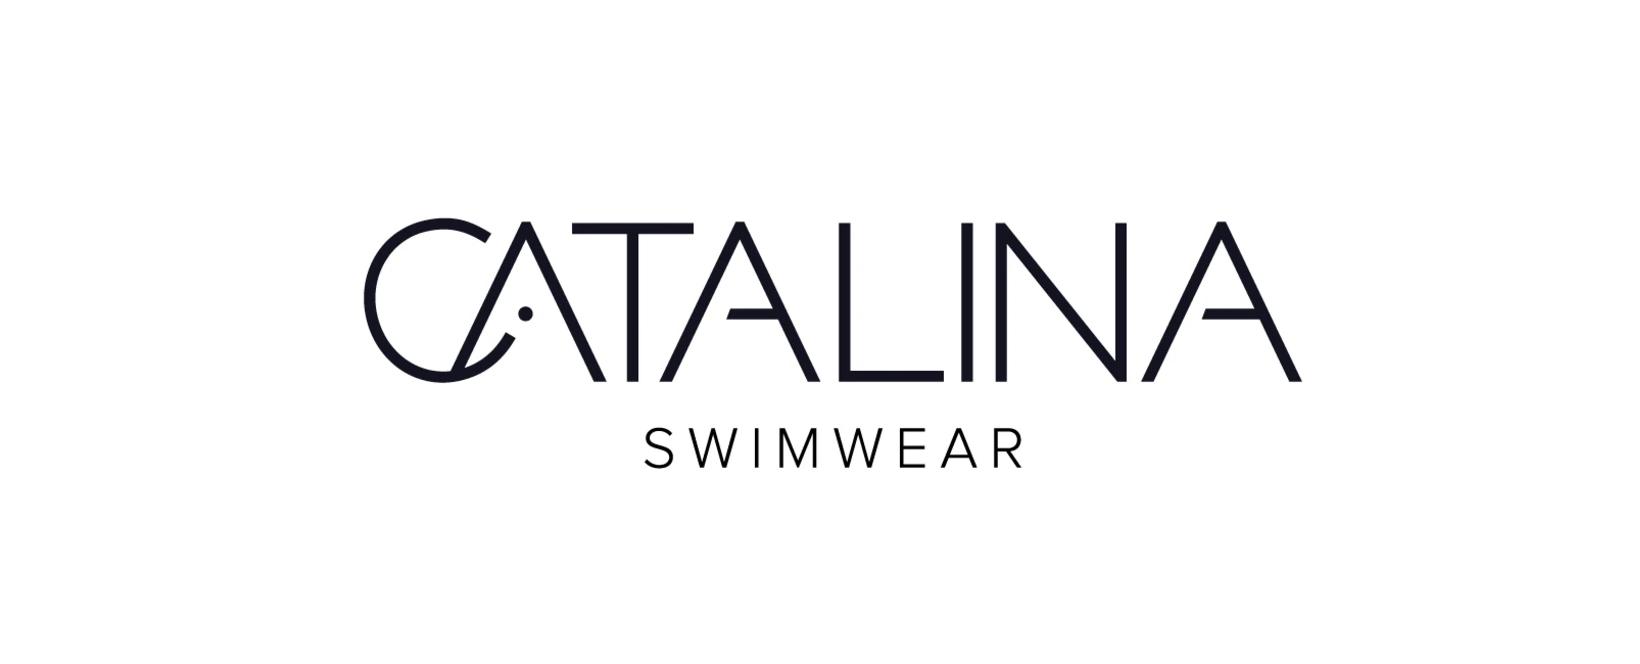 Catalina Swim Coupon Code 2021